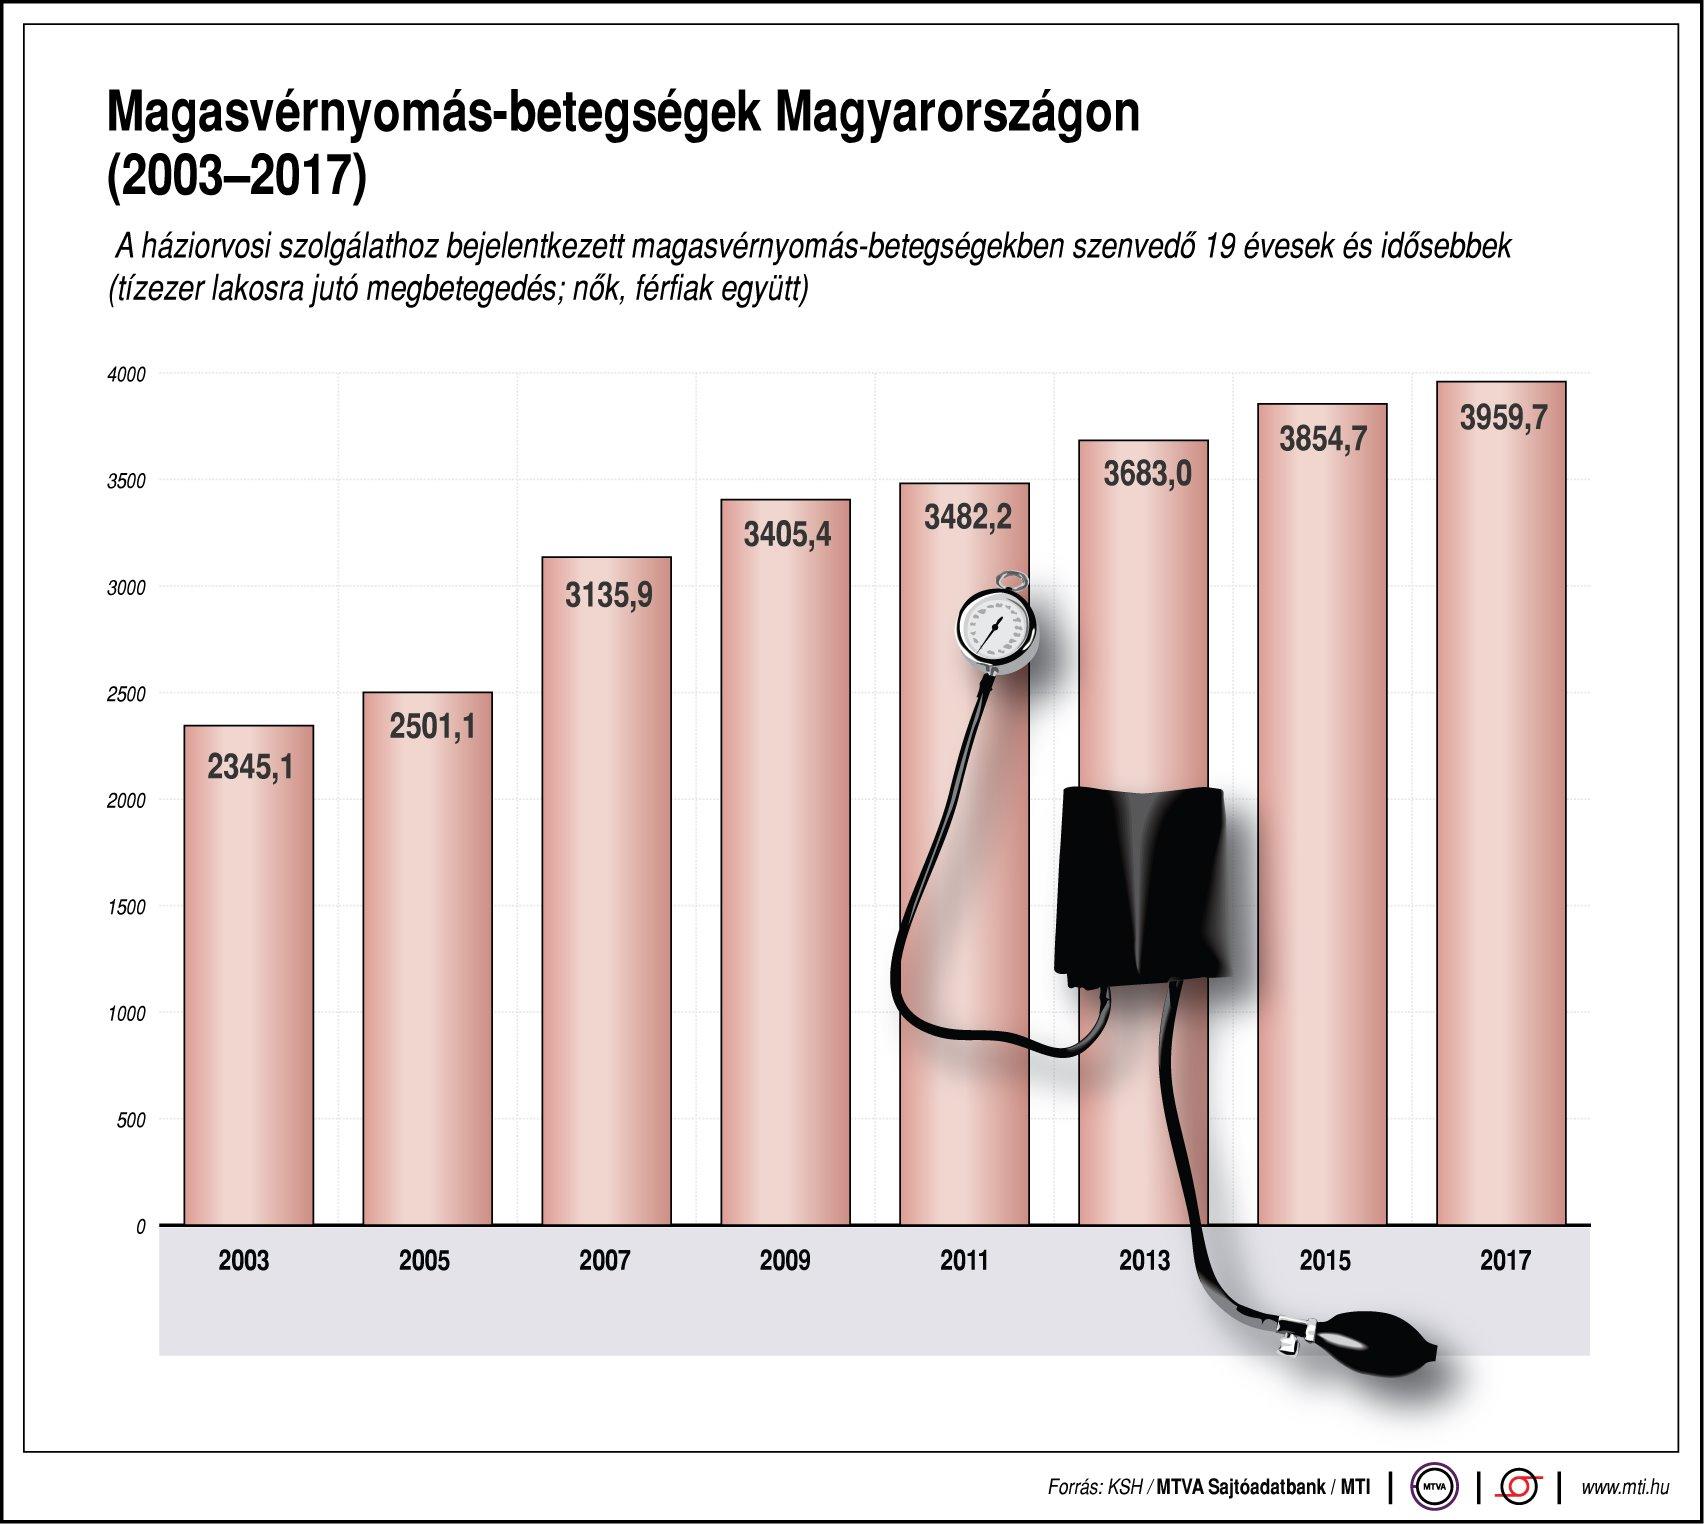 magas vérnyomás fáradtság letargia